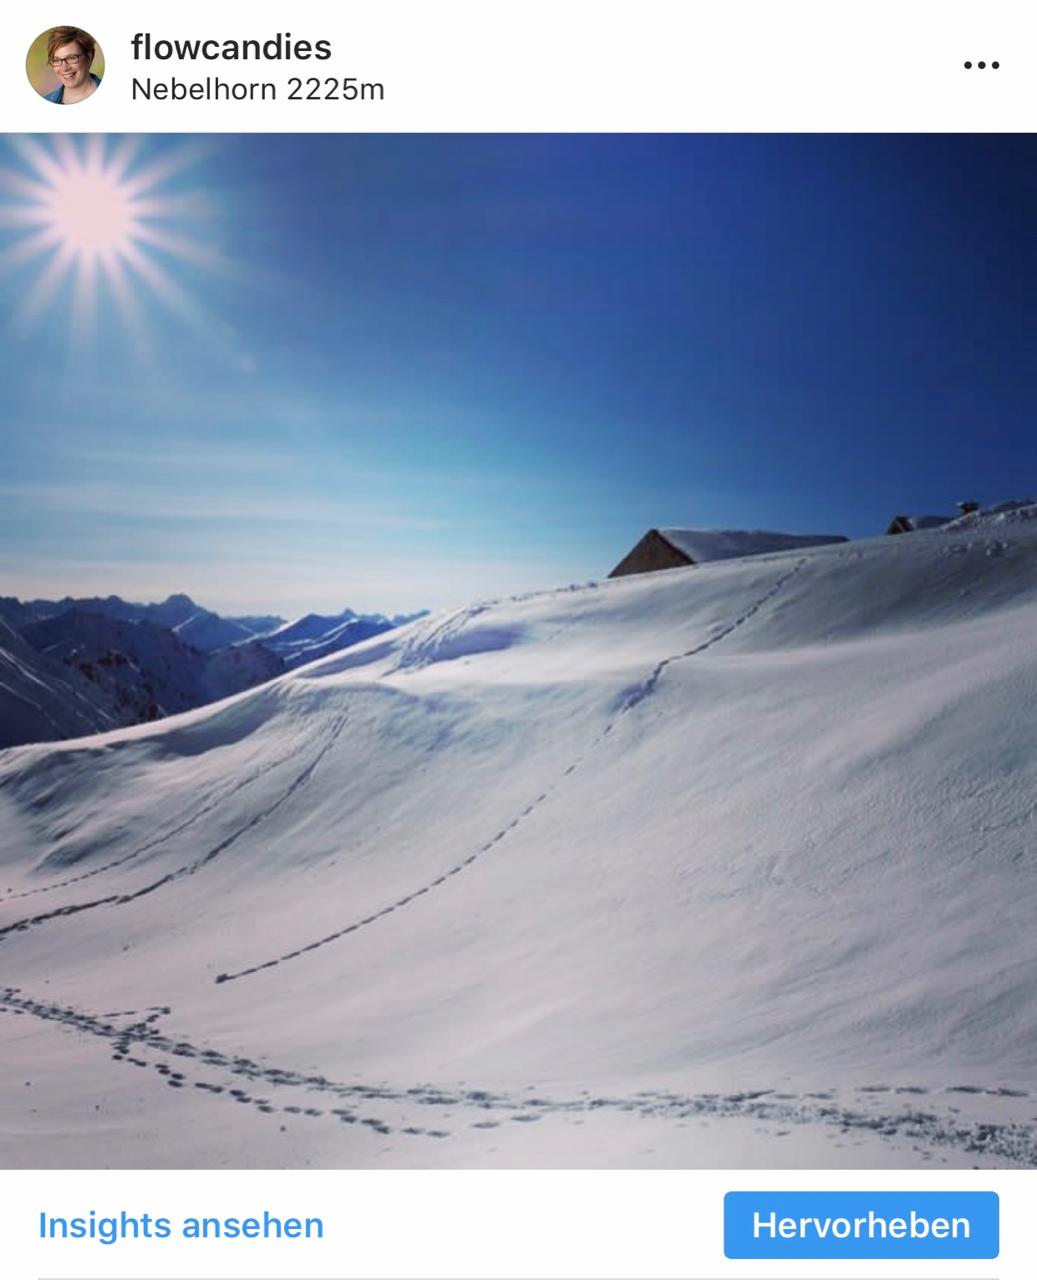 Instagram Oberstdorf: Nebelhorn im Schnee